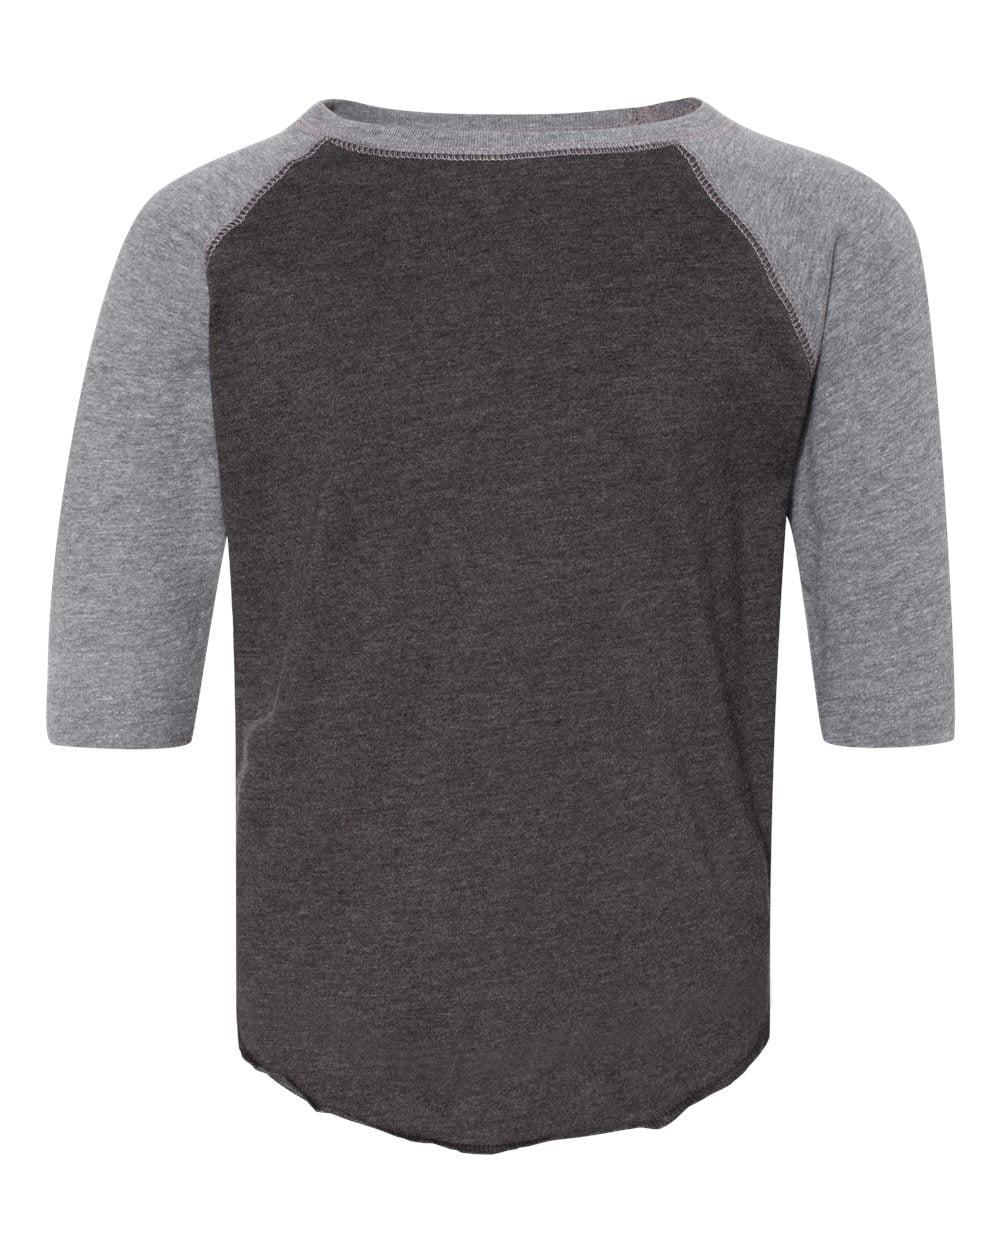 Rabbit Skins Fine Jersey Toddler Three-Quarter Sleeve Baseball T-Shirt 3330